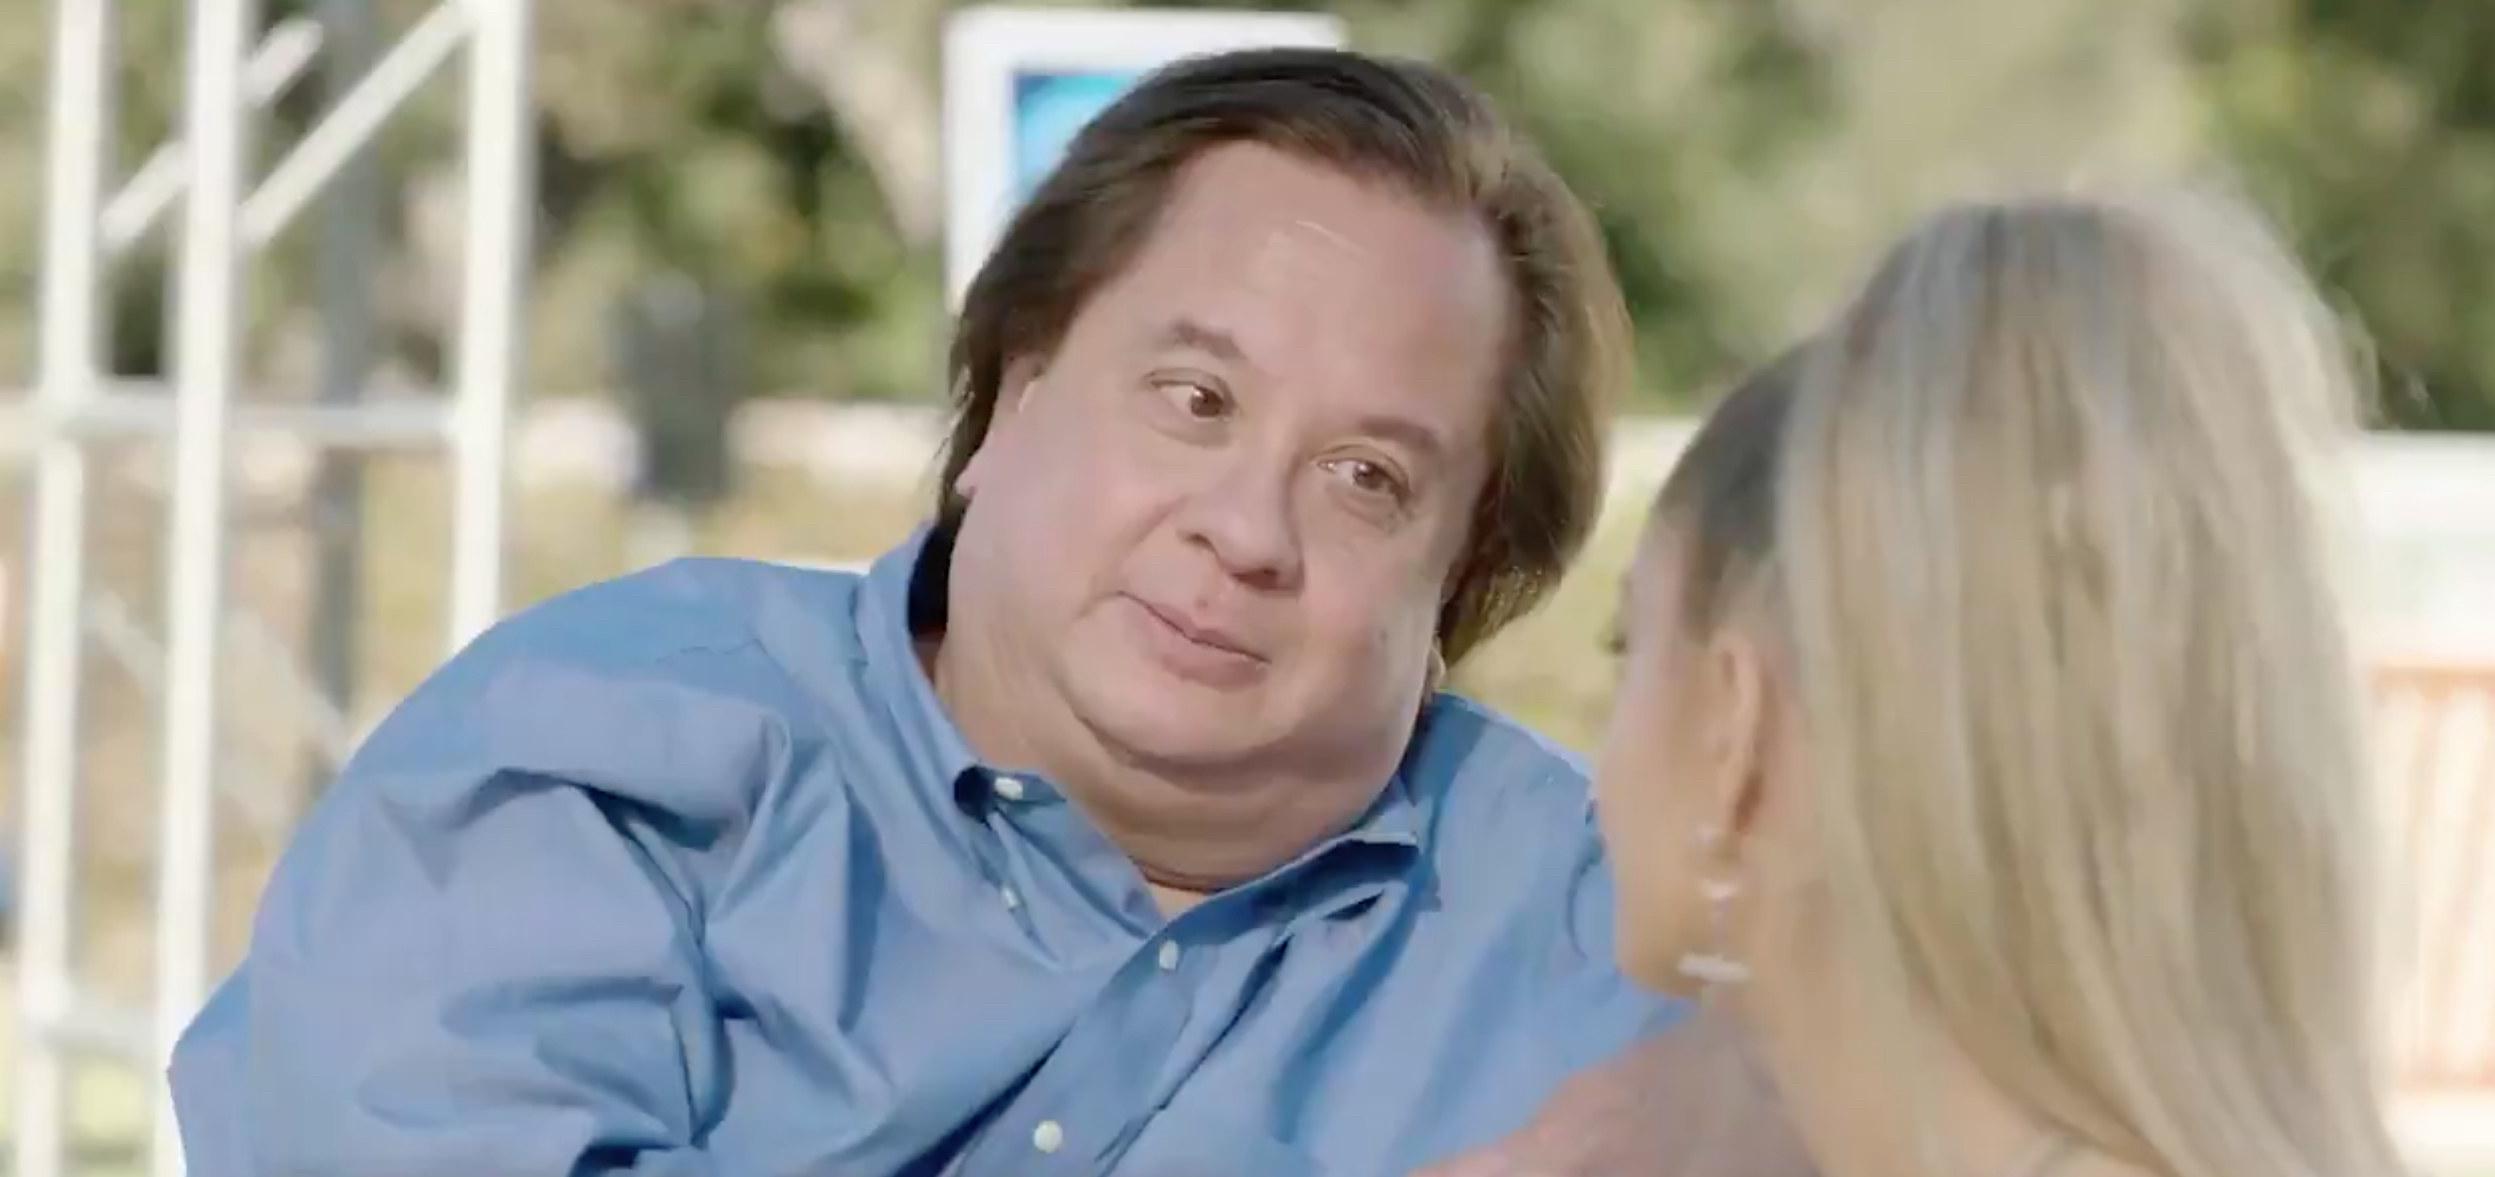 George Conway on the season premiere of American Idol